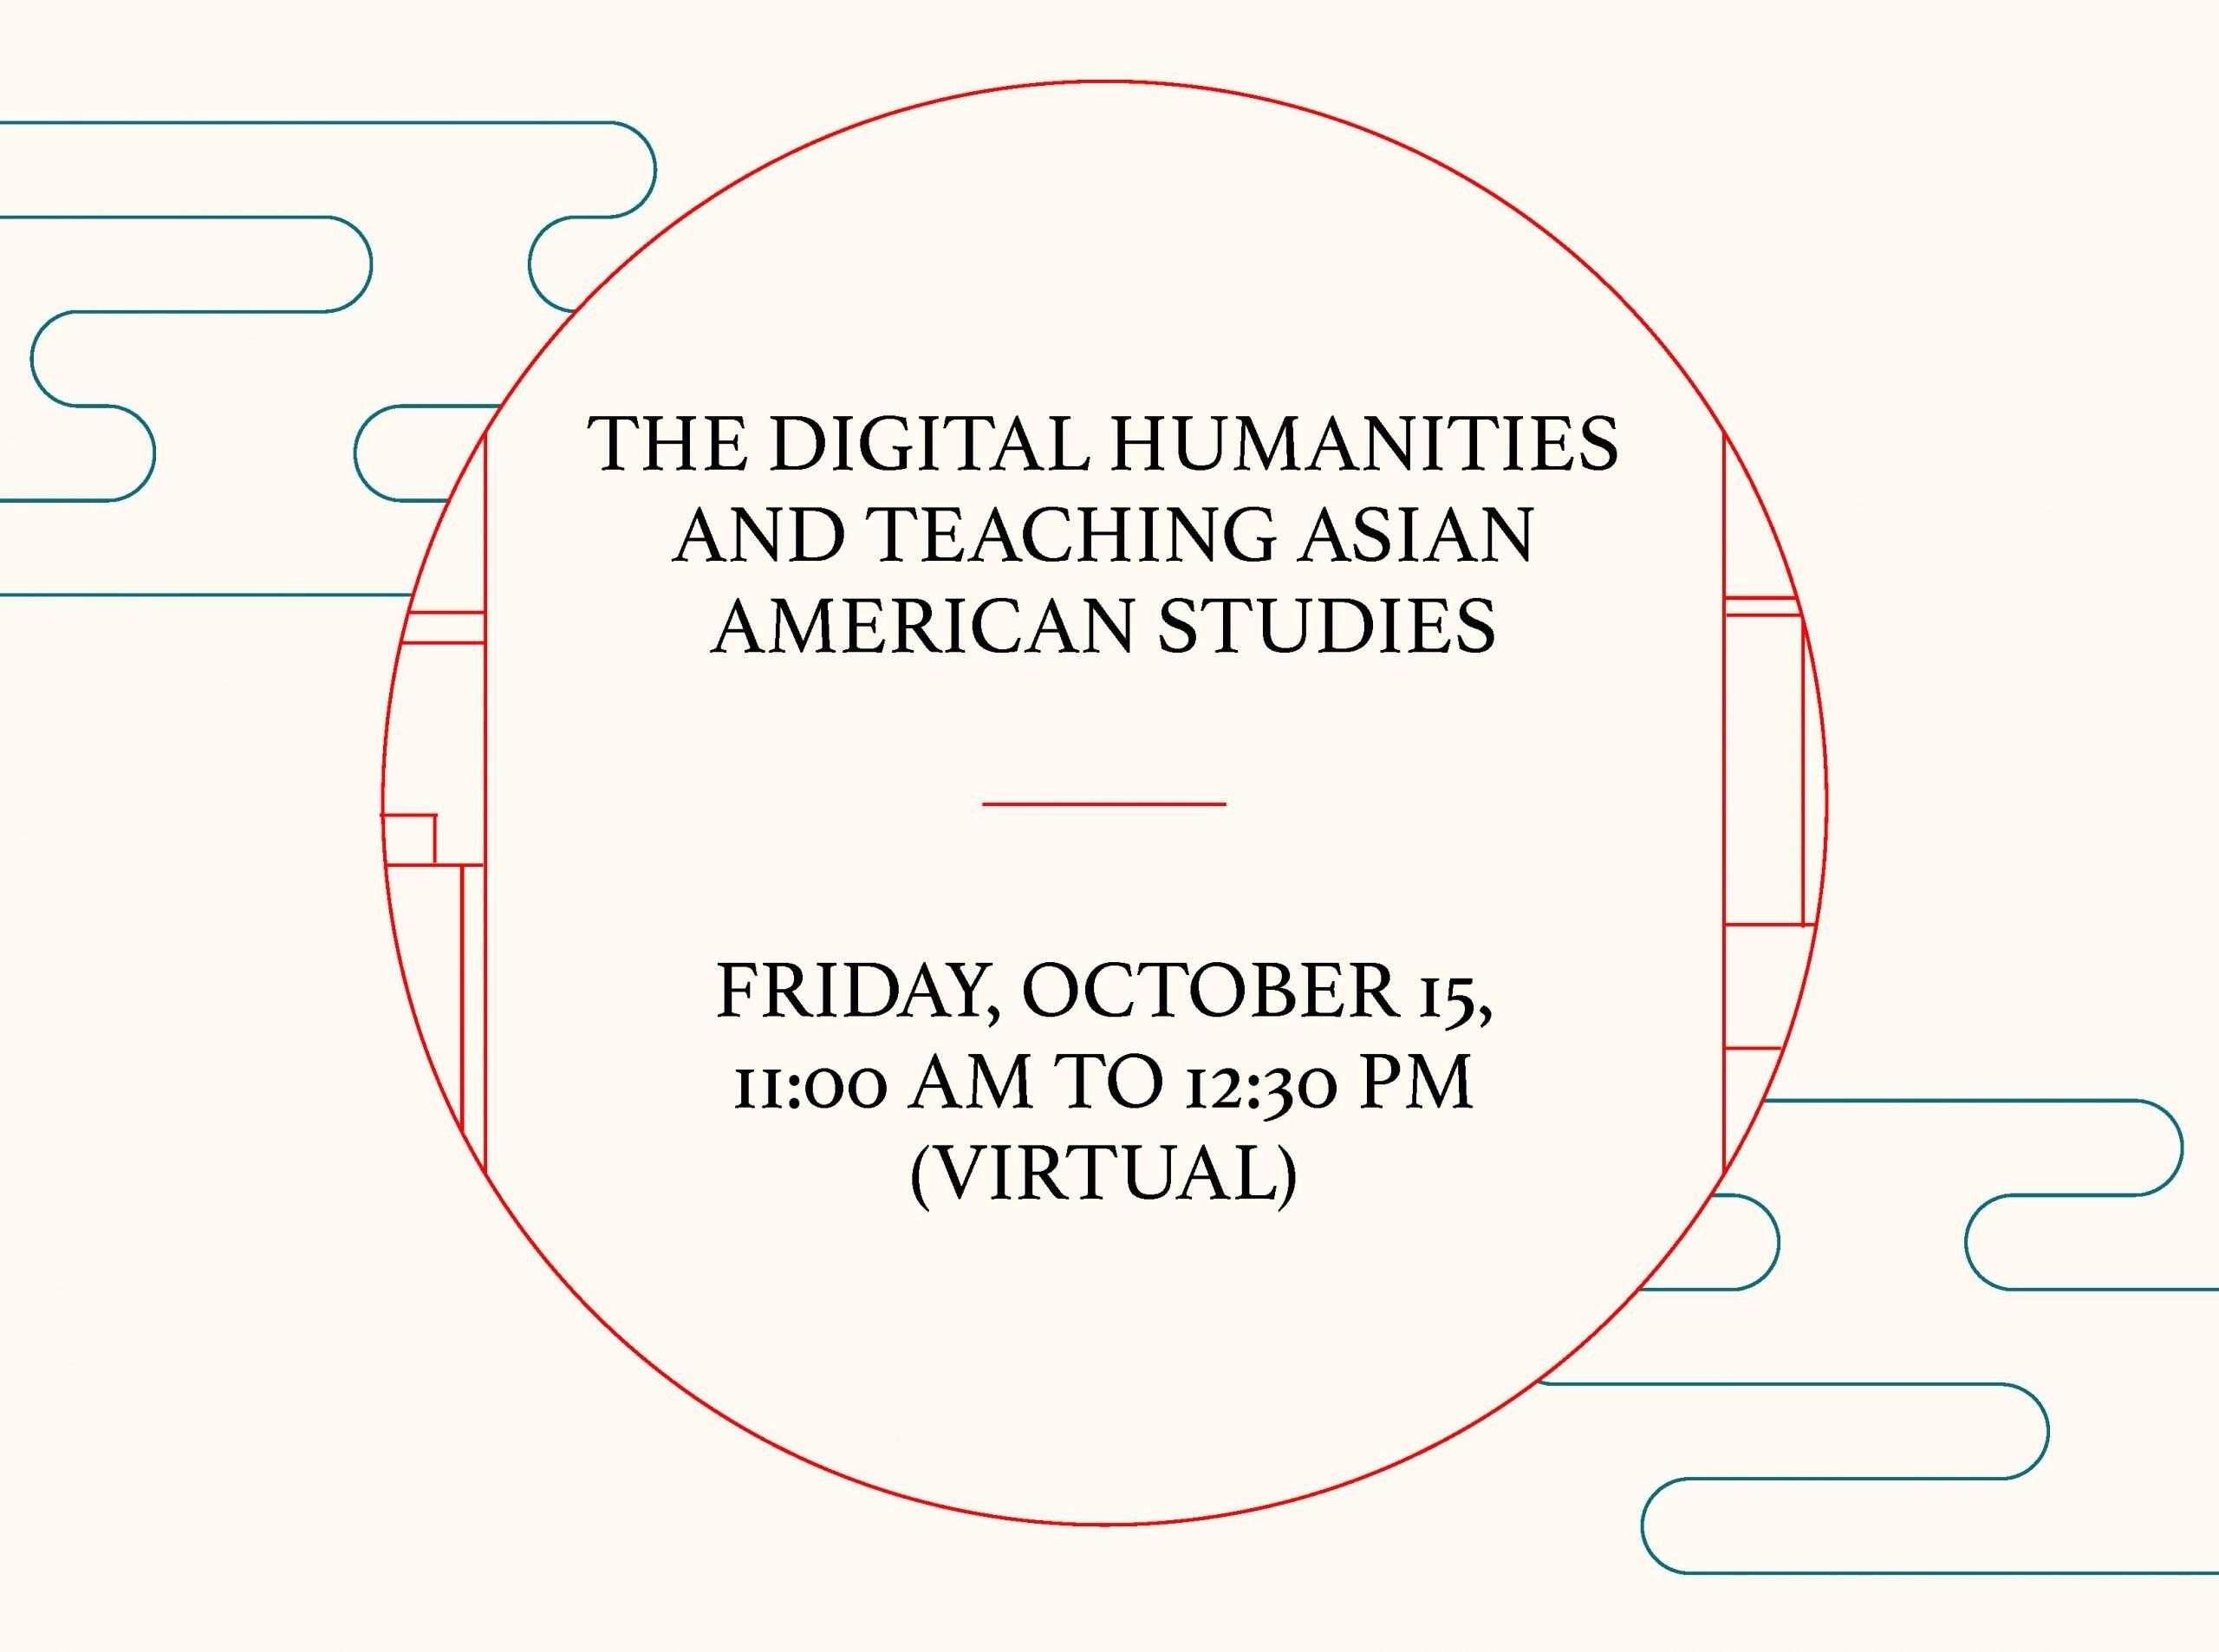 Digital Humanities and Teaching Asian American Studies Poster